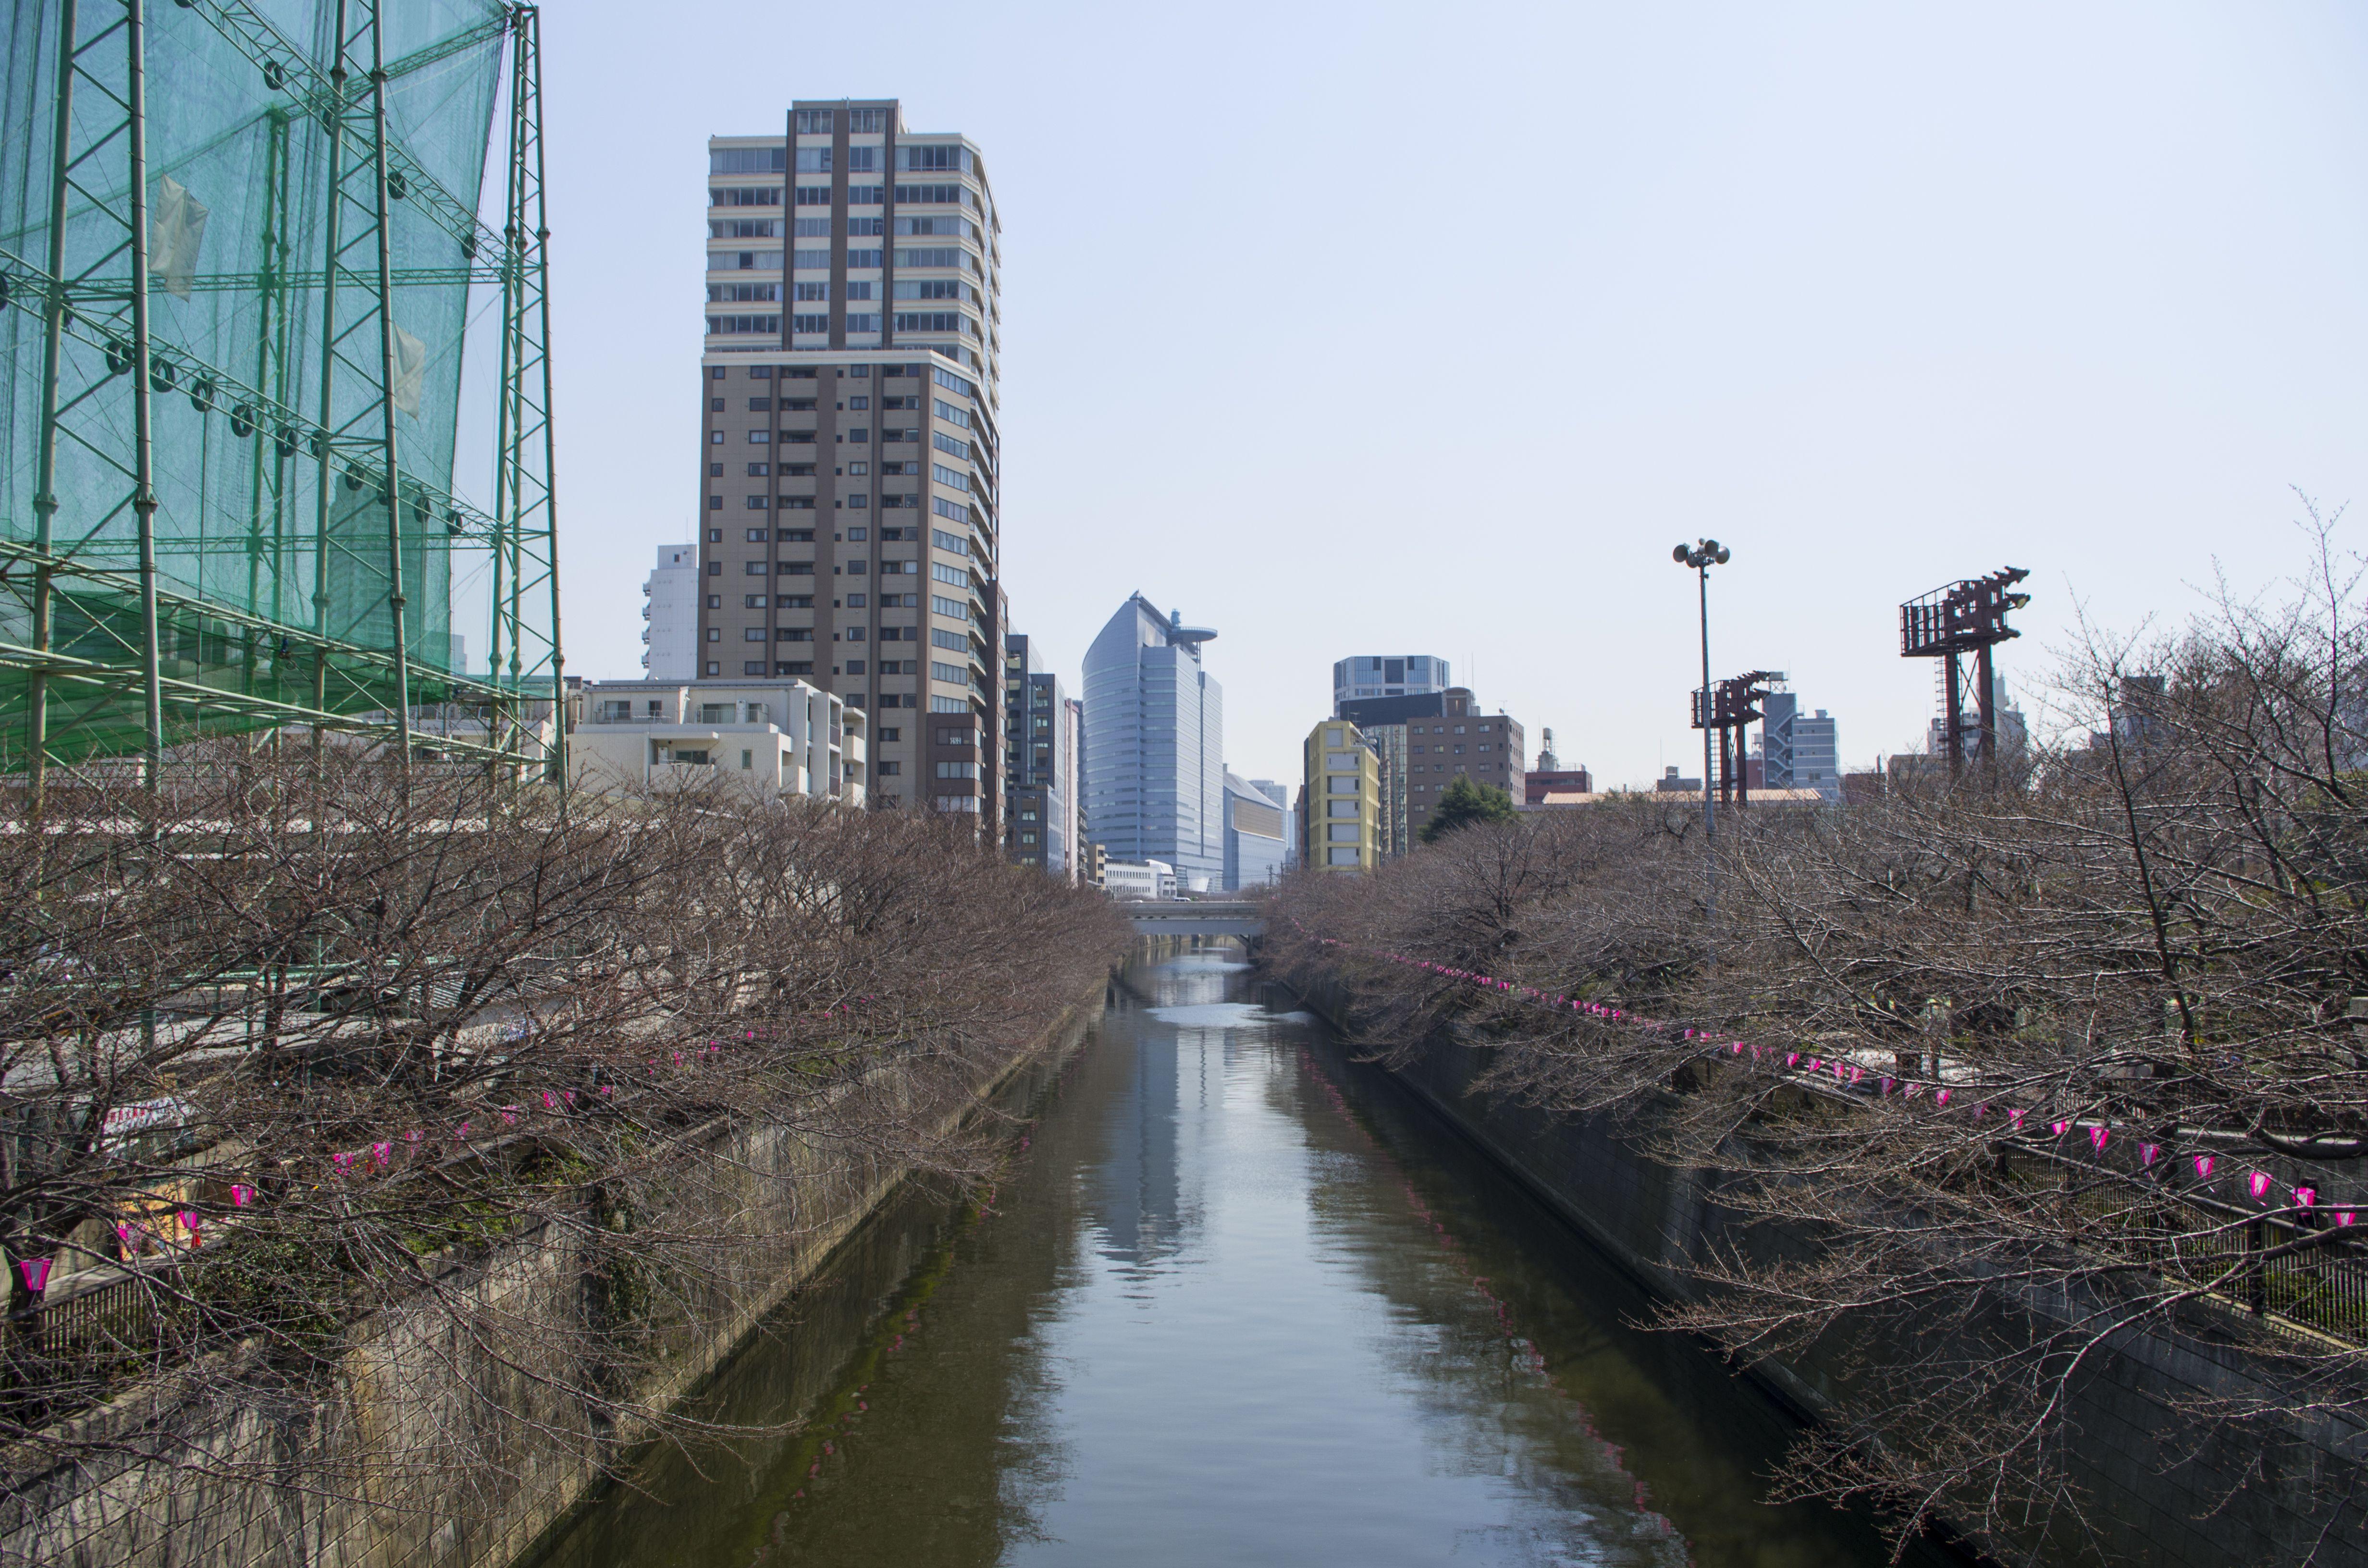 Banks of Meguro river prepared for the hanami festival